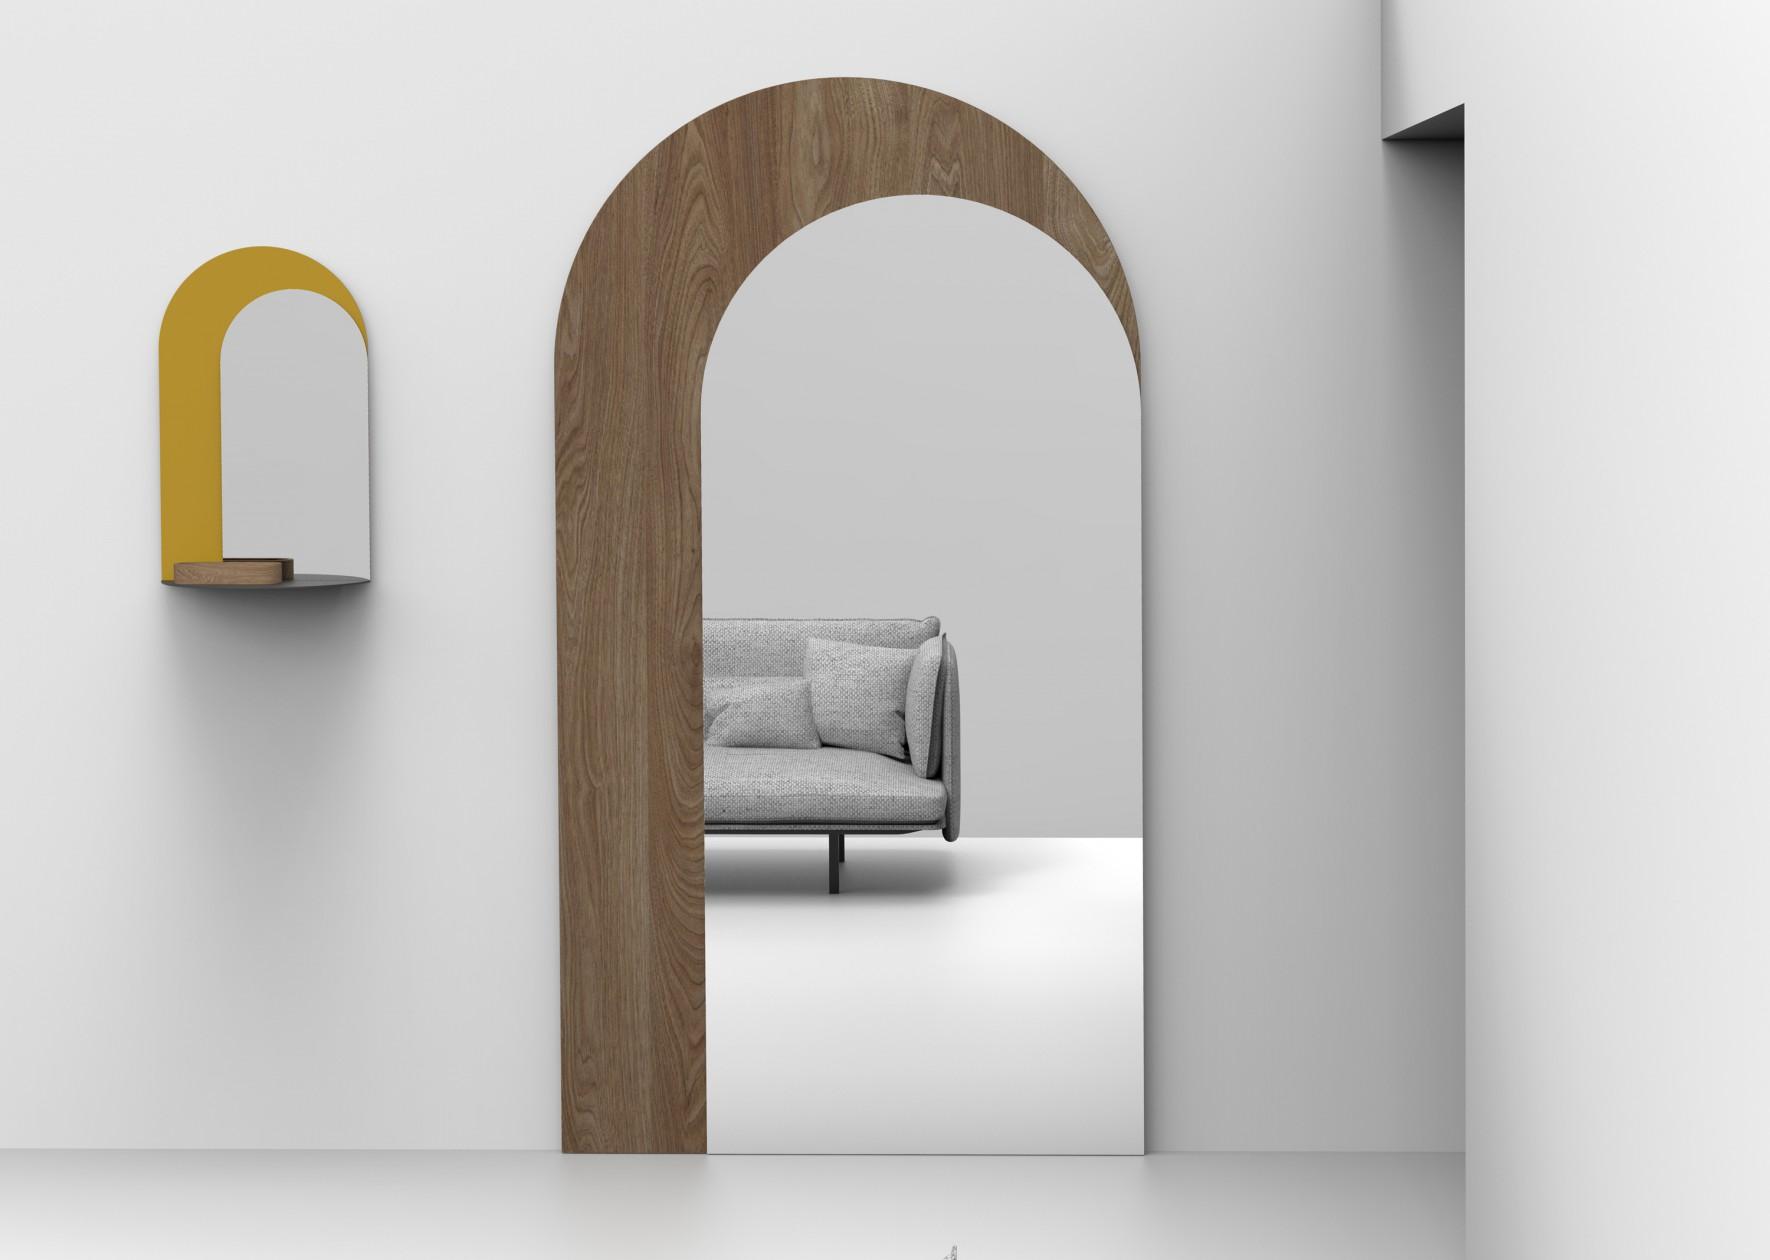 trompe l 39 oeil alain gilles. Black Bedroom Furniture Sets. Home Design Ideas